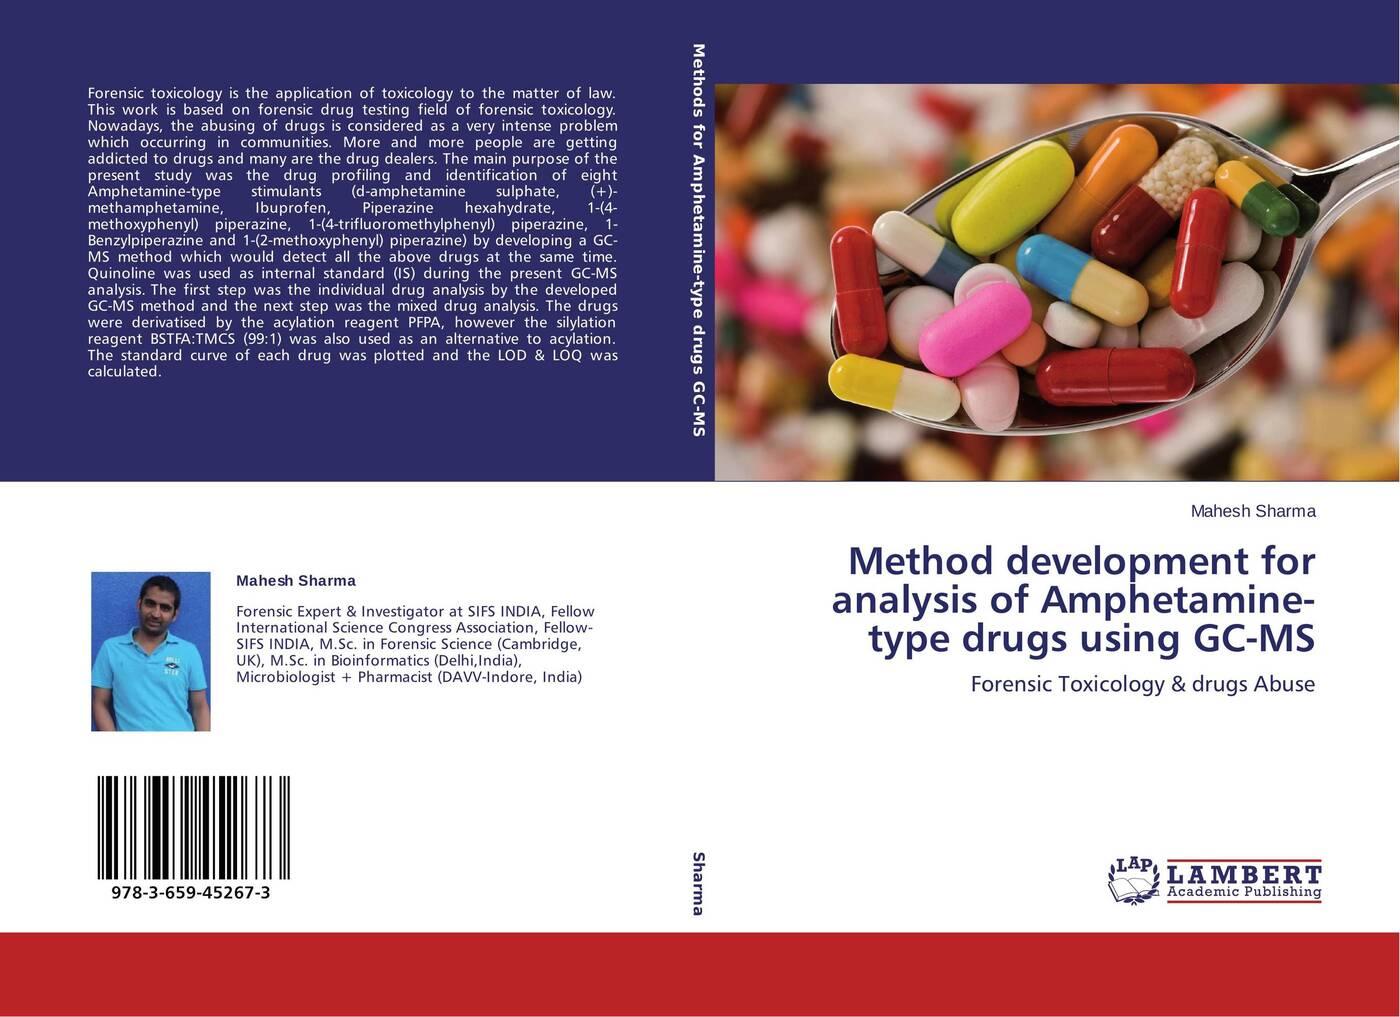 Mahesh Sharma Method development for analysis of Amphetamine-type drugs using GC-MS fred smith handbook of forensic drug analysis